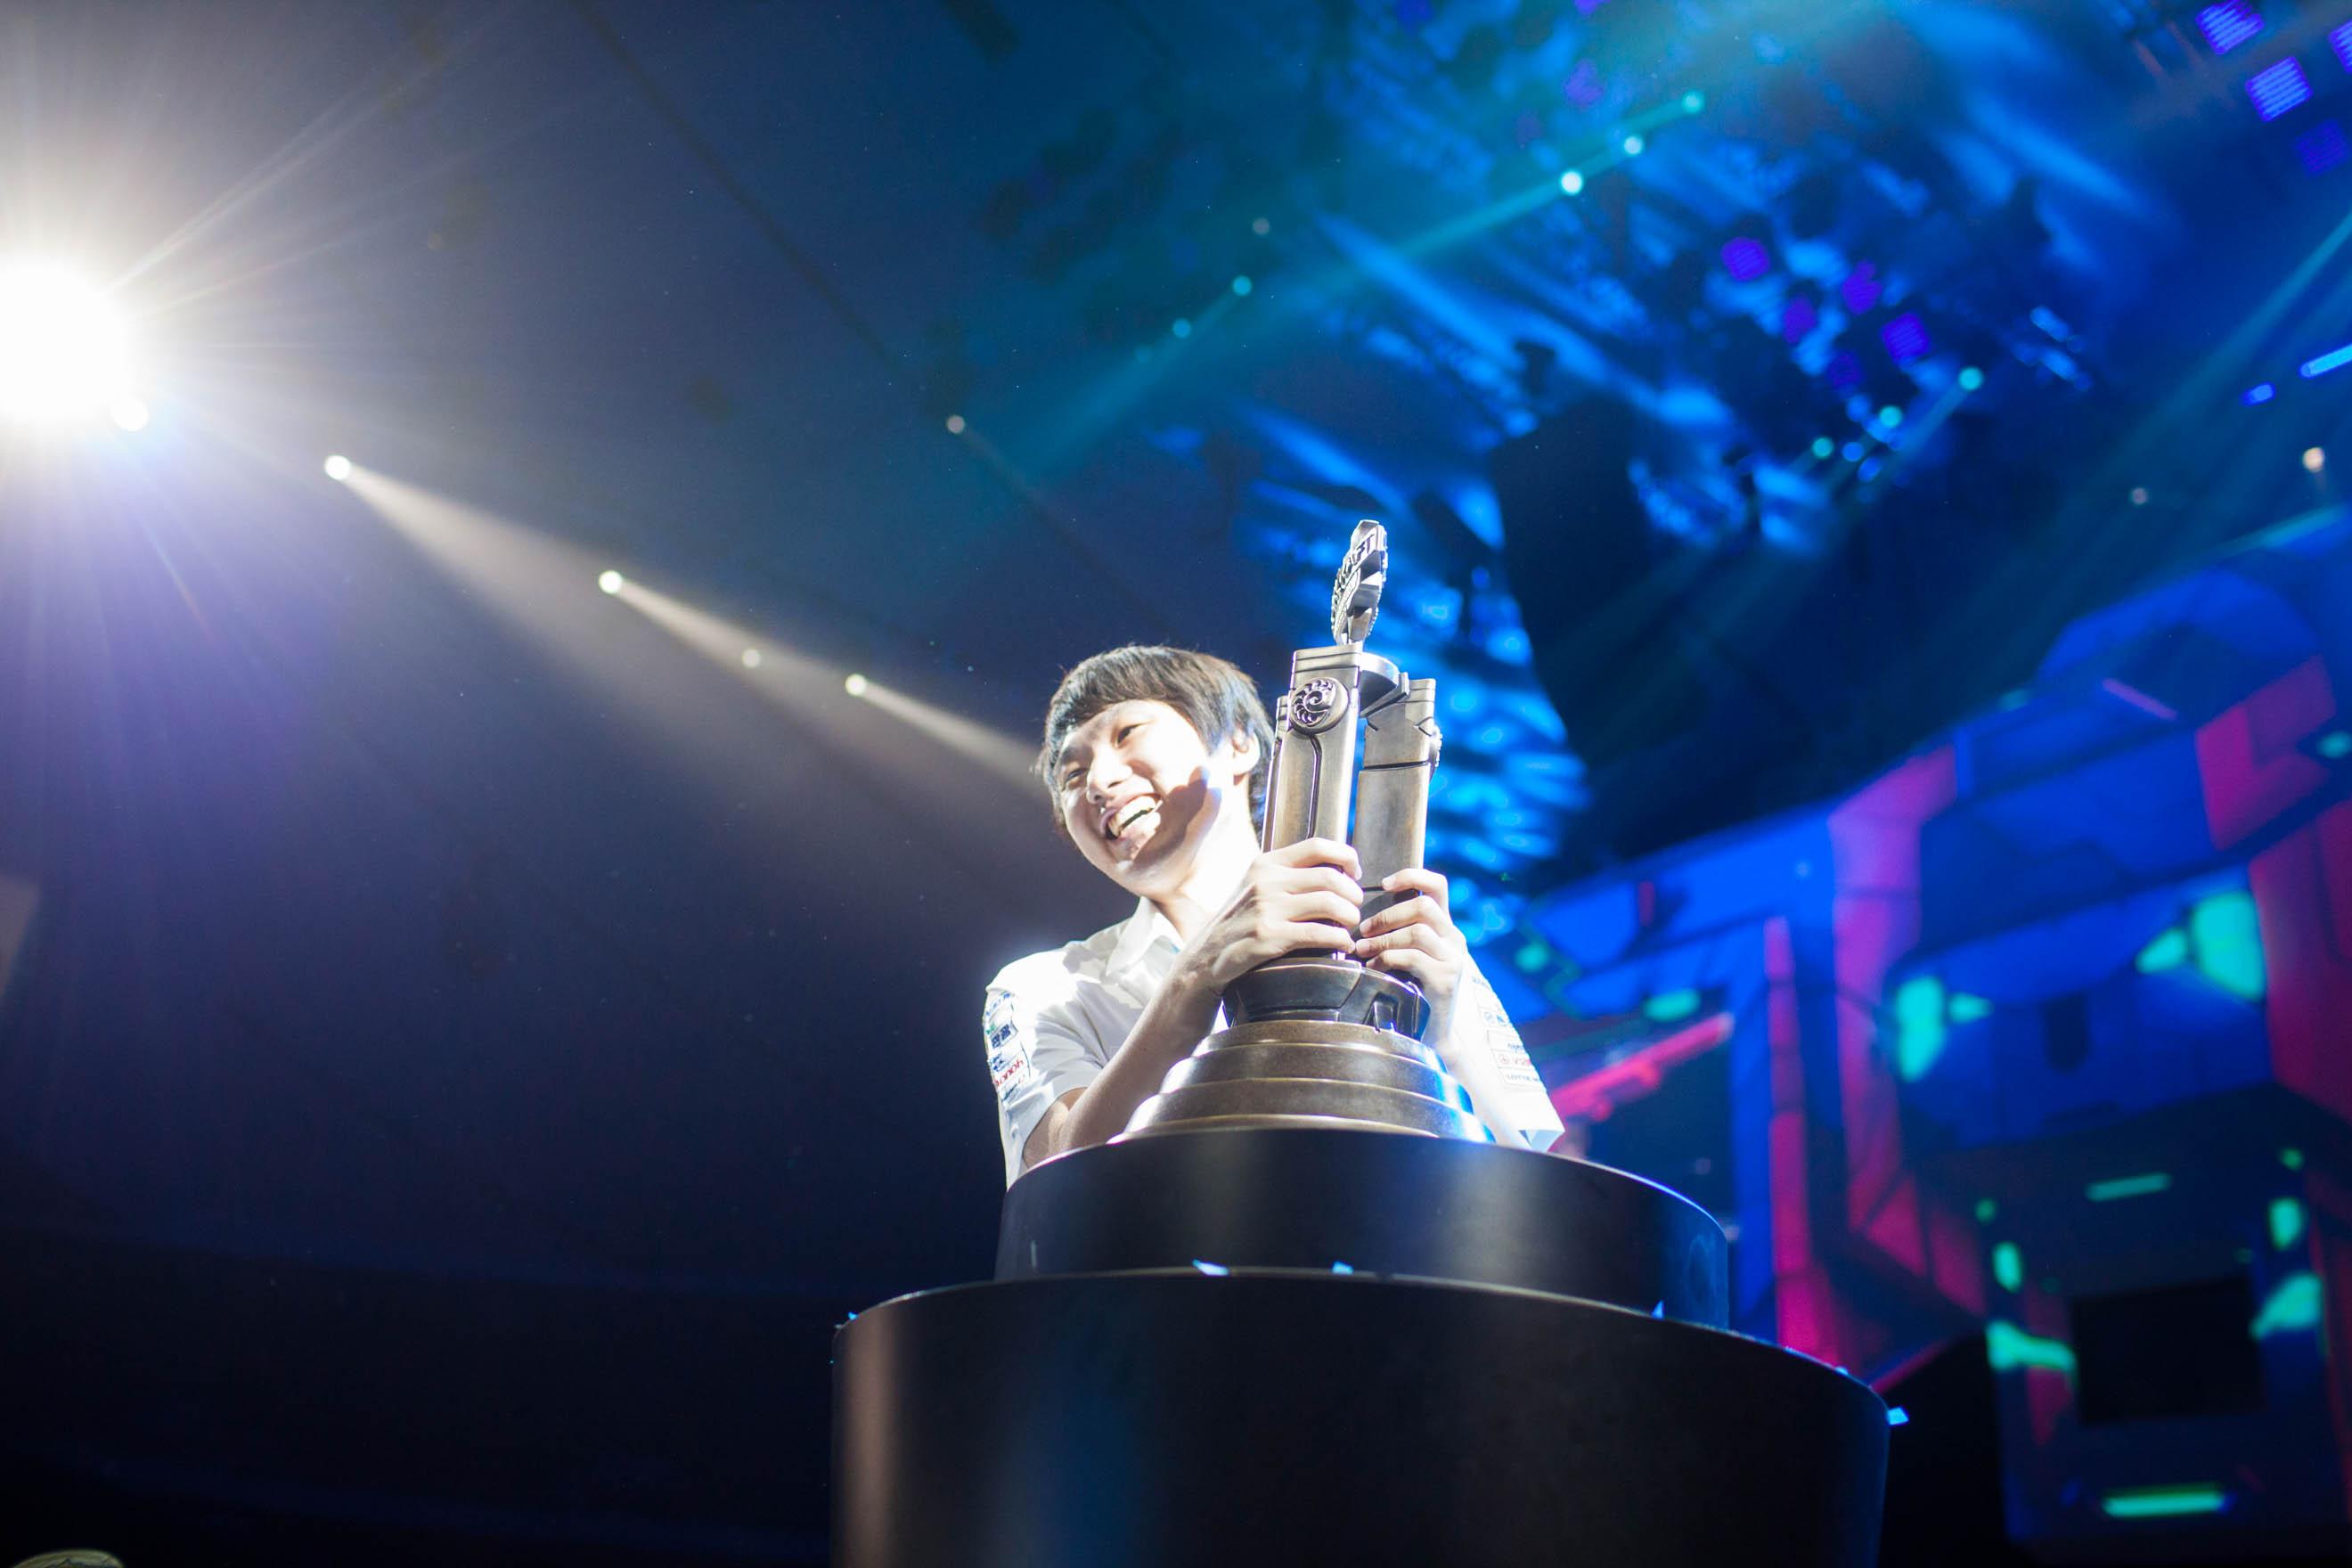 SoS struggling to lift his winner's trophy.